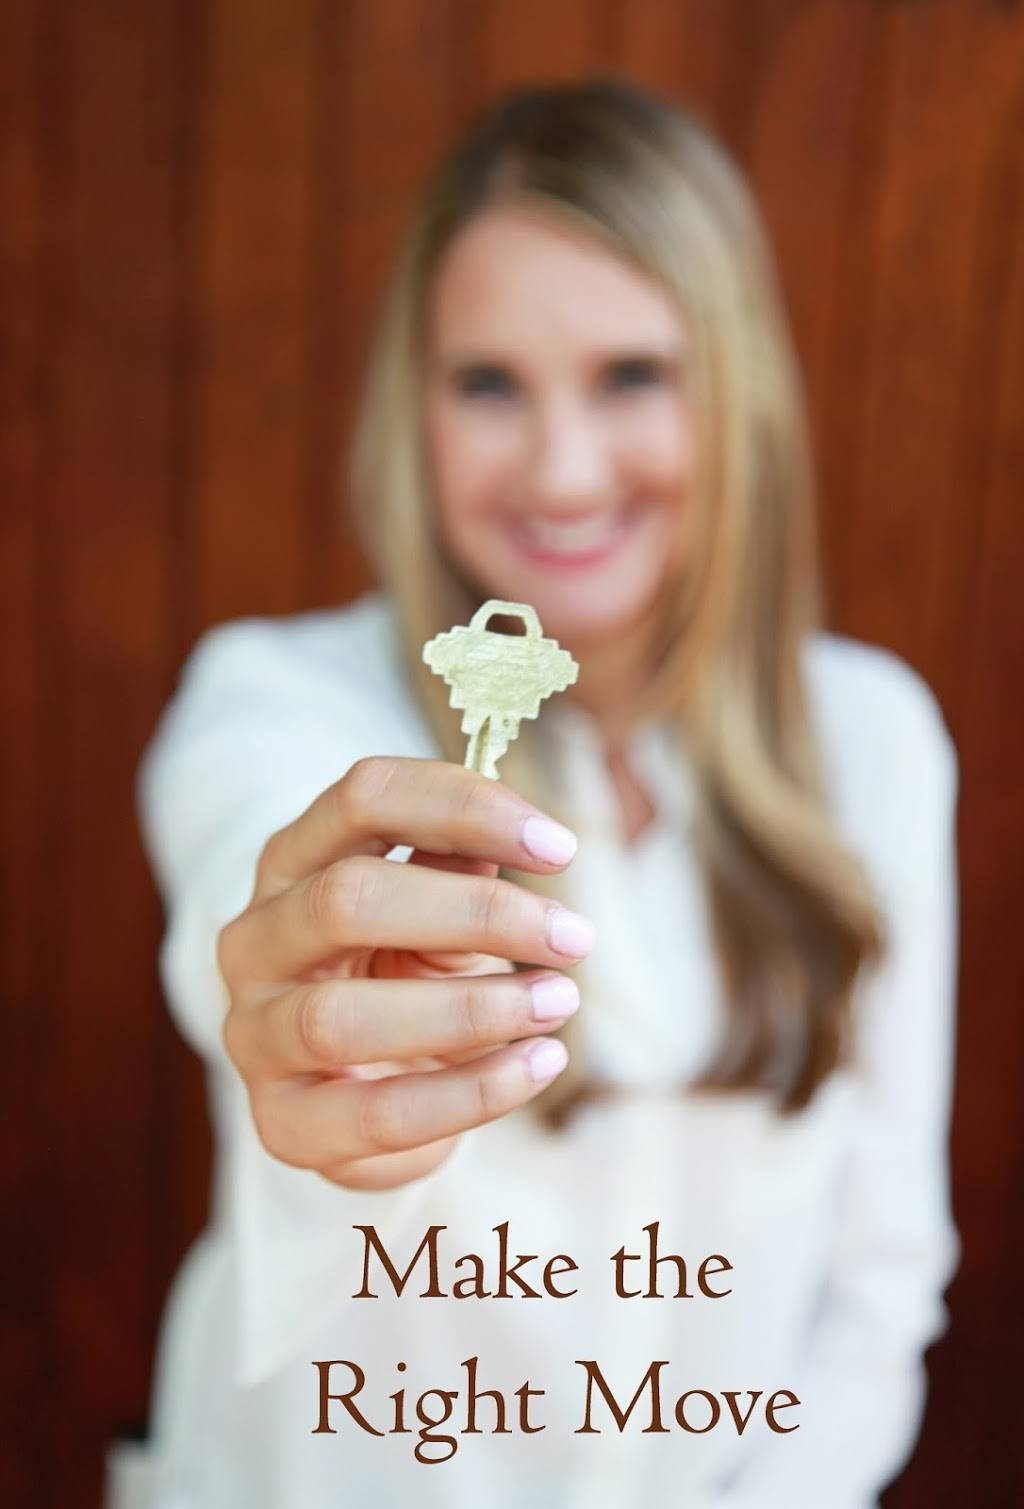 Marela Turkic - Marela Realty Group of Keller Williams - real estate agency  | Photo 4 of 5 | Address: 3150 N Elm St #101, Greensboro, NC 27408, USA | Phone: (336) 255-4078